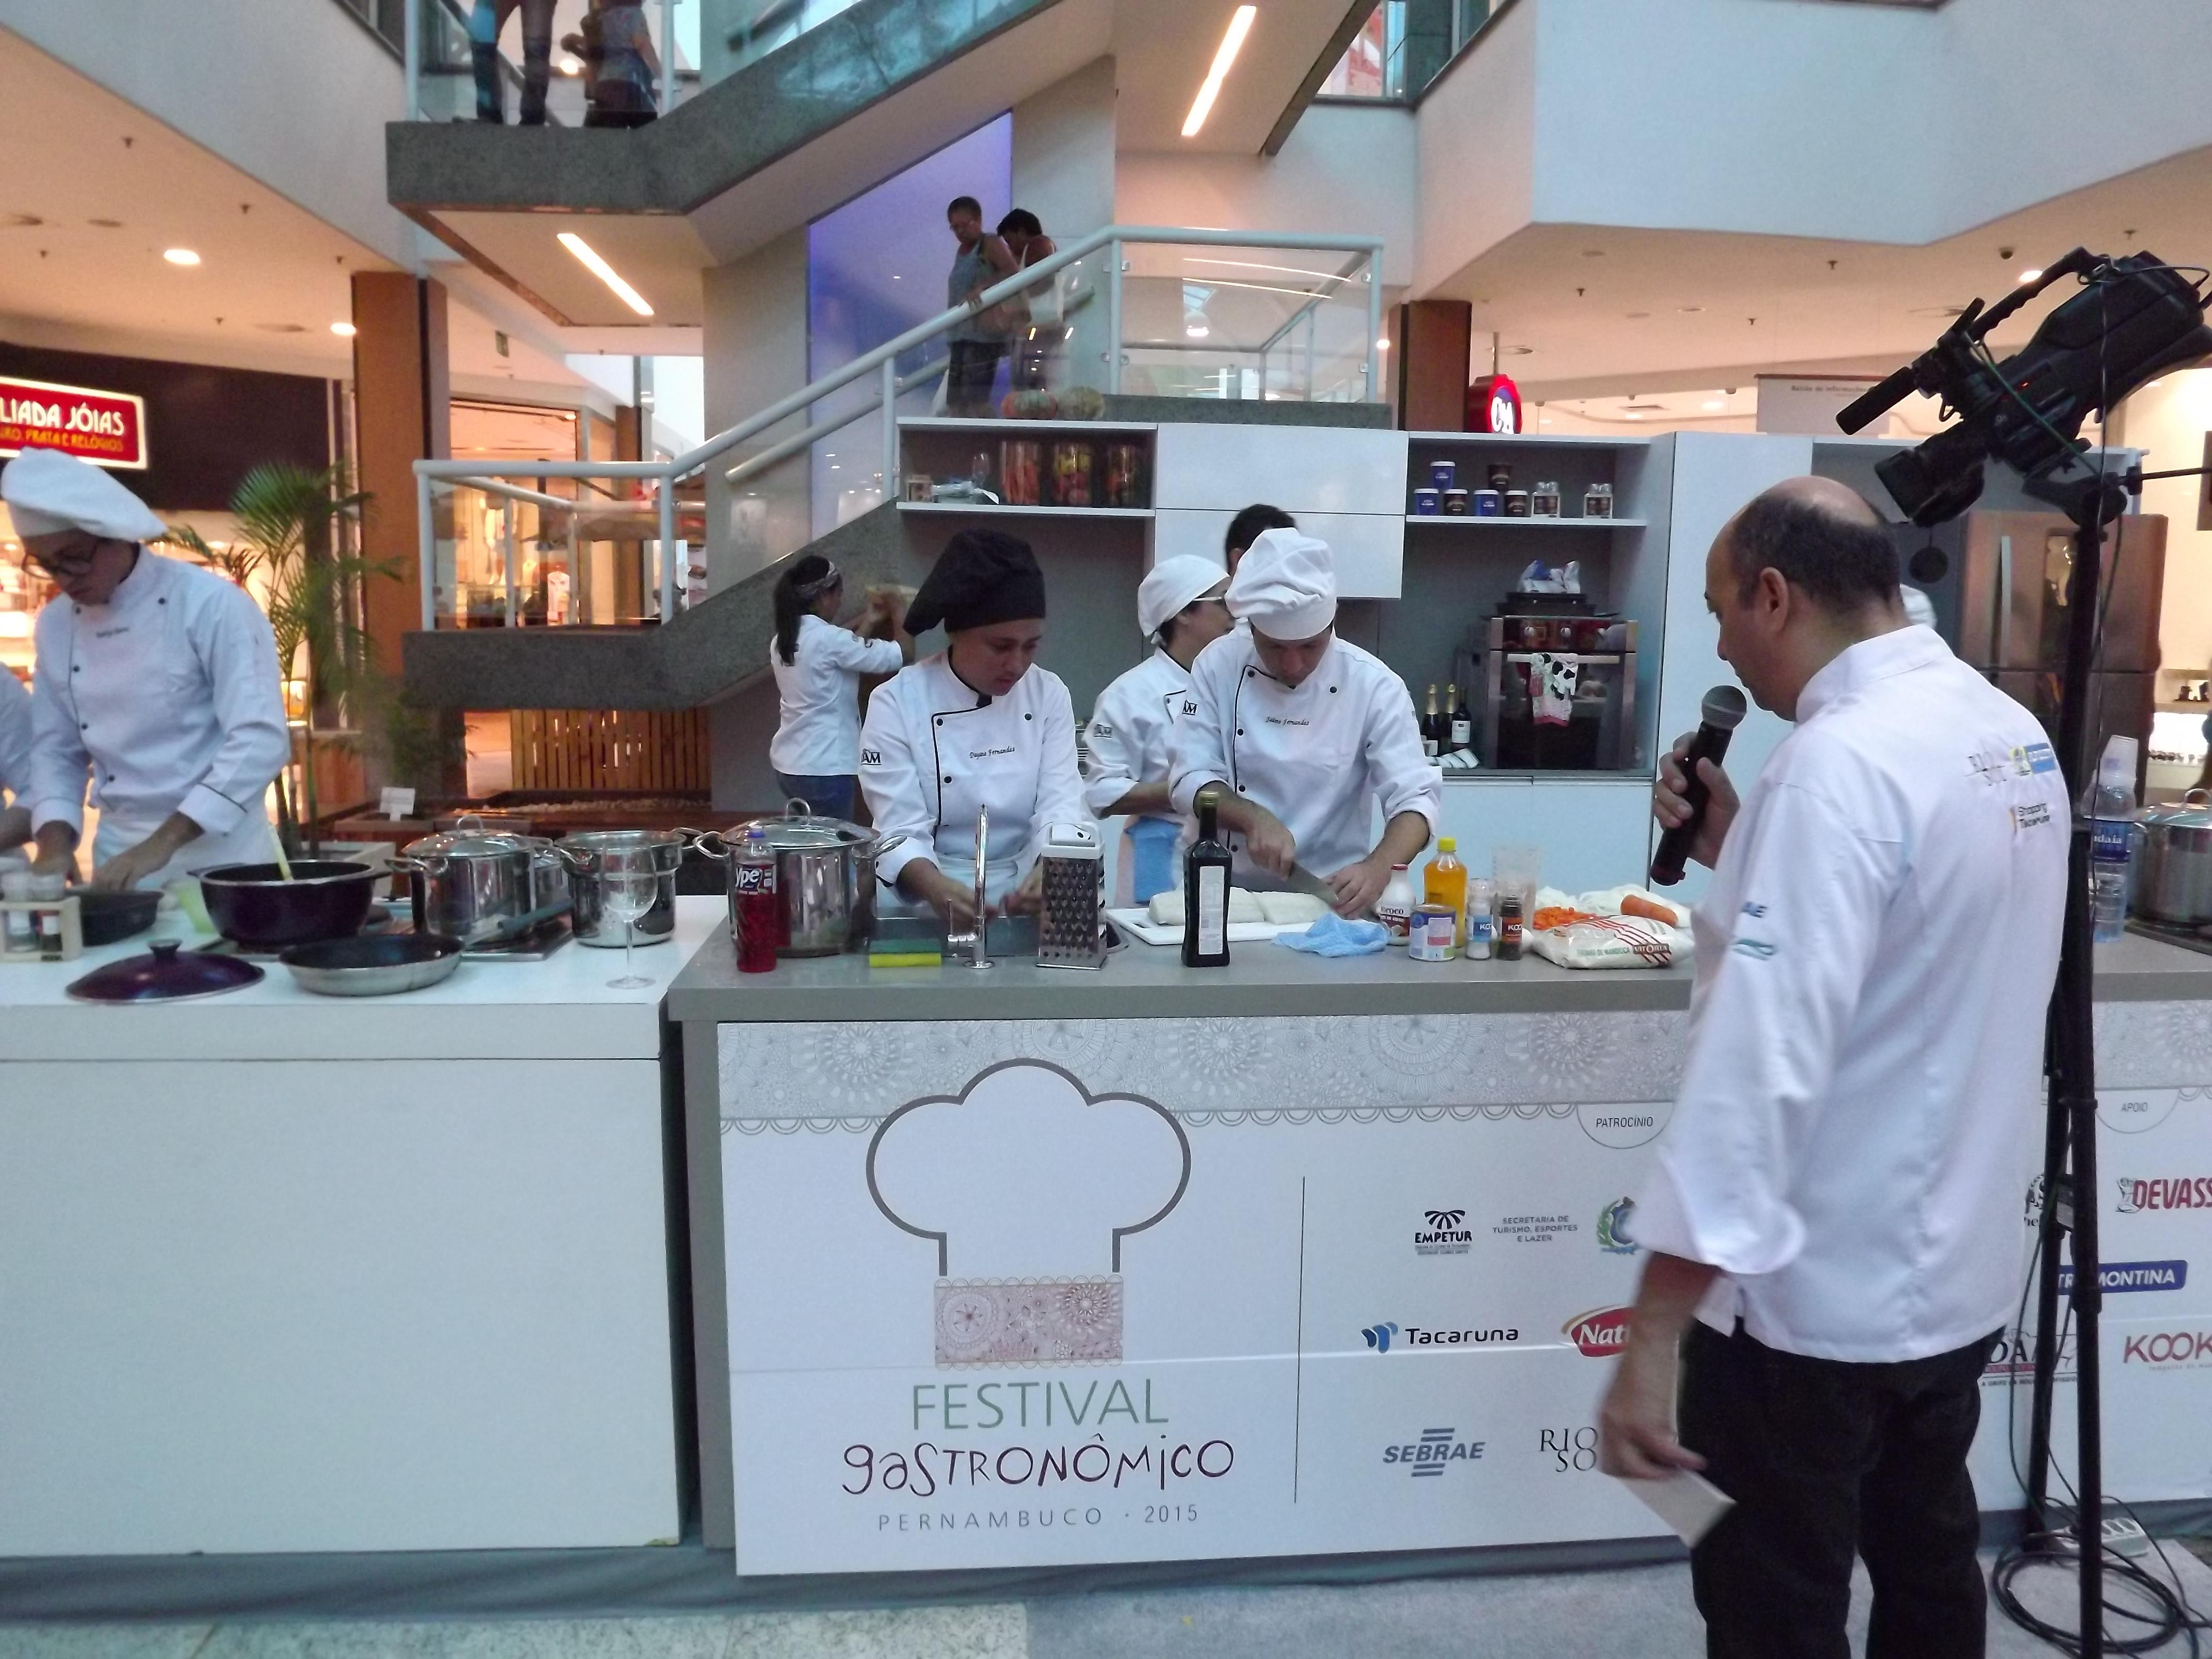 Alunos Do Curso De Gastronomia Da Faculdade Metropolitana Levam O 3